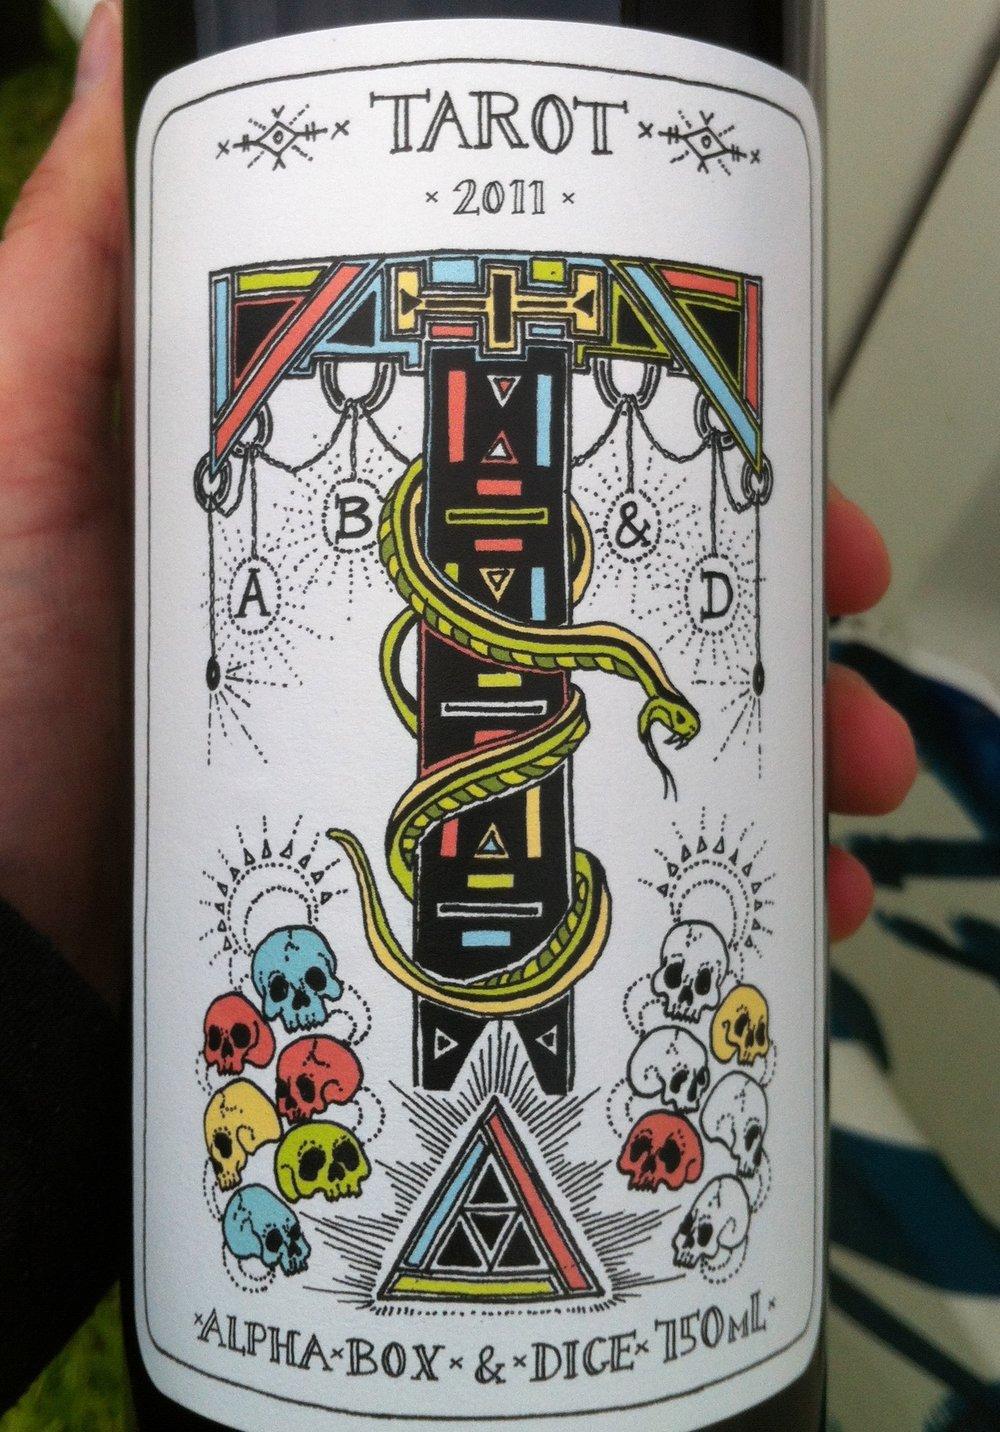 Bottle of Tarot from Alpha Box & Dice.